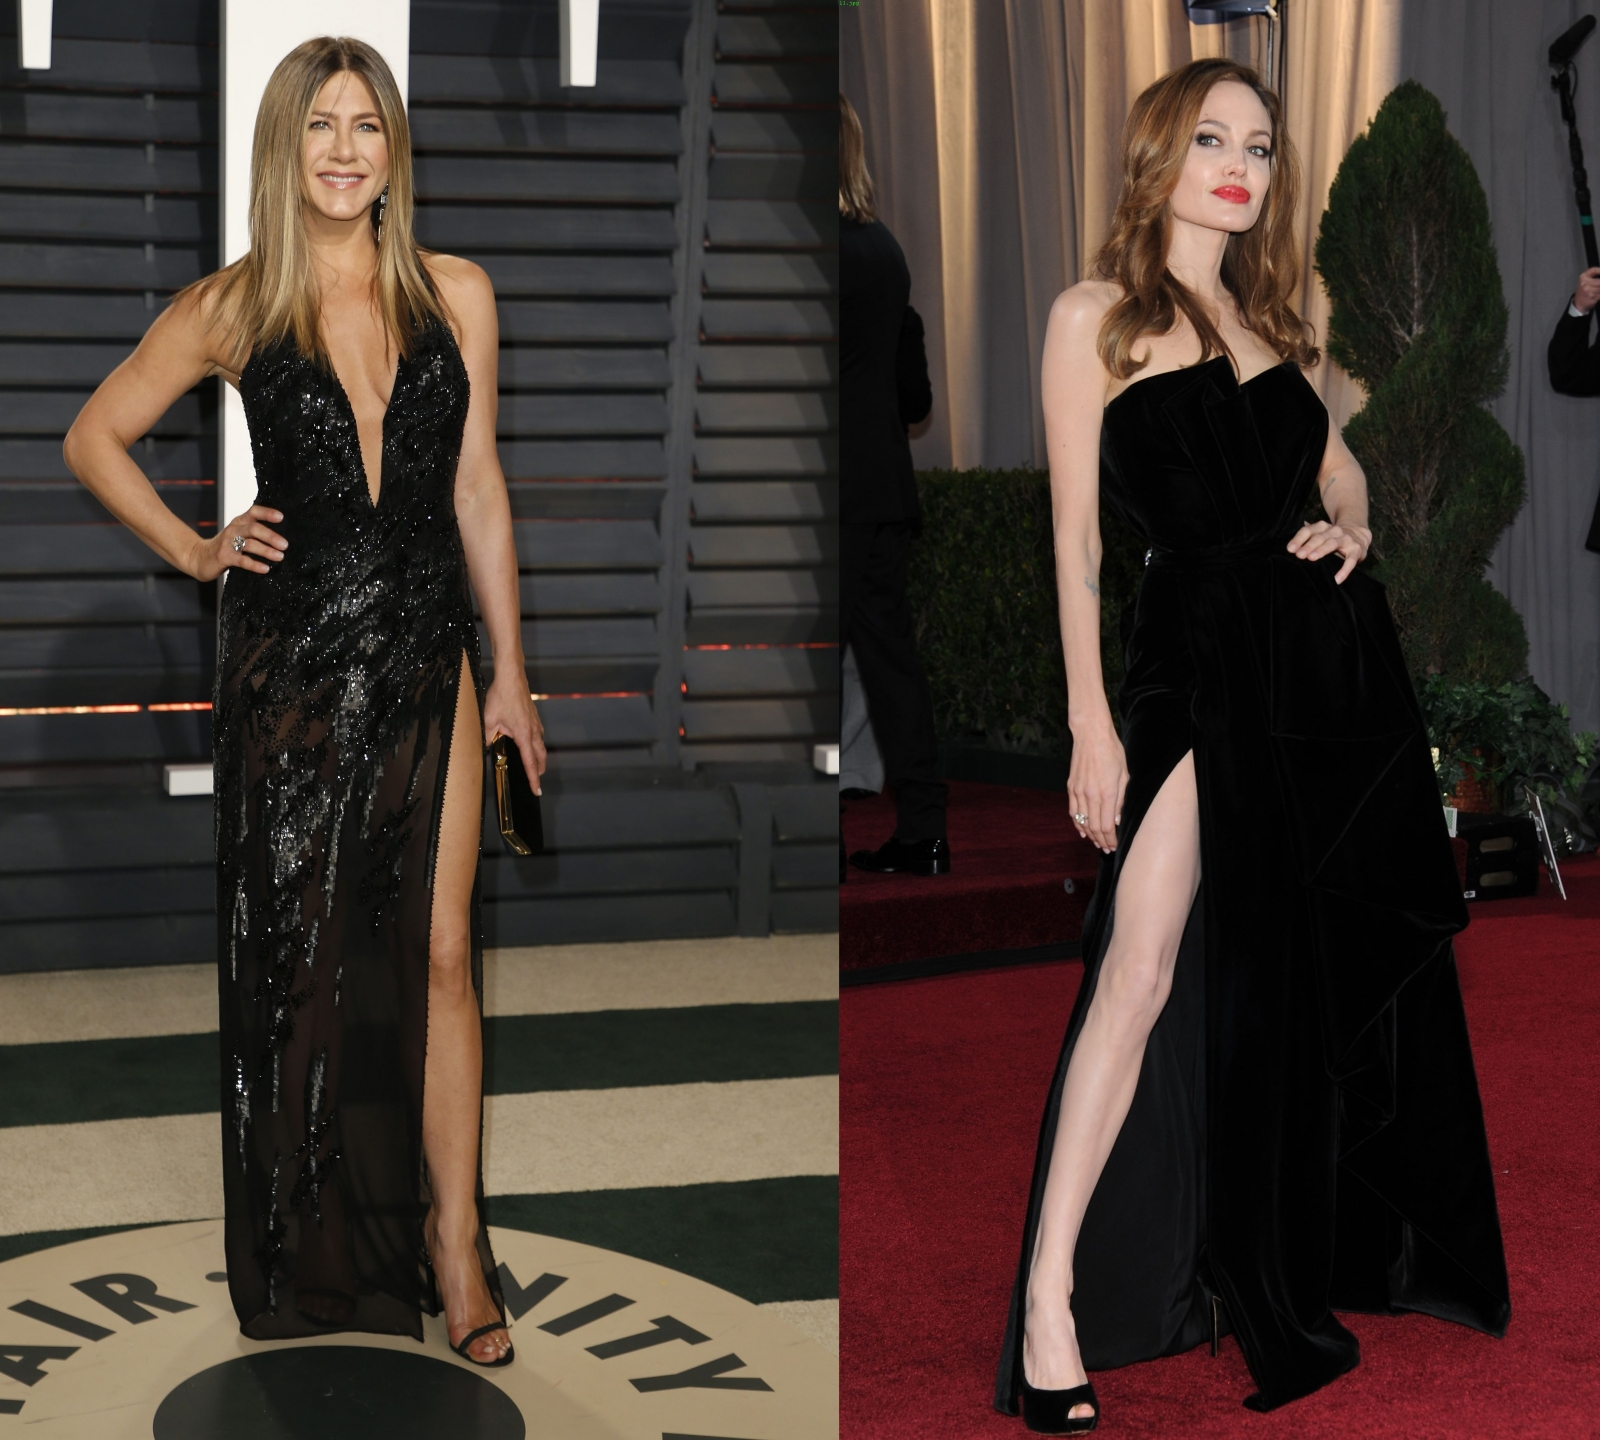 Jennifer Aniston and Angelina Jolie